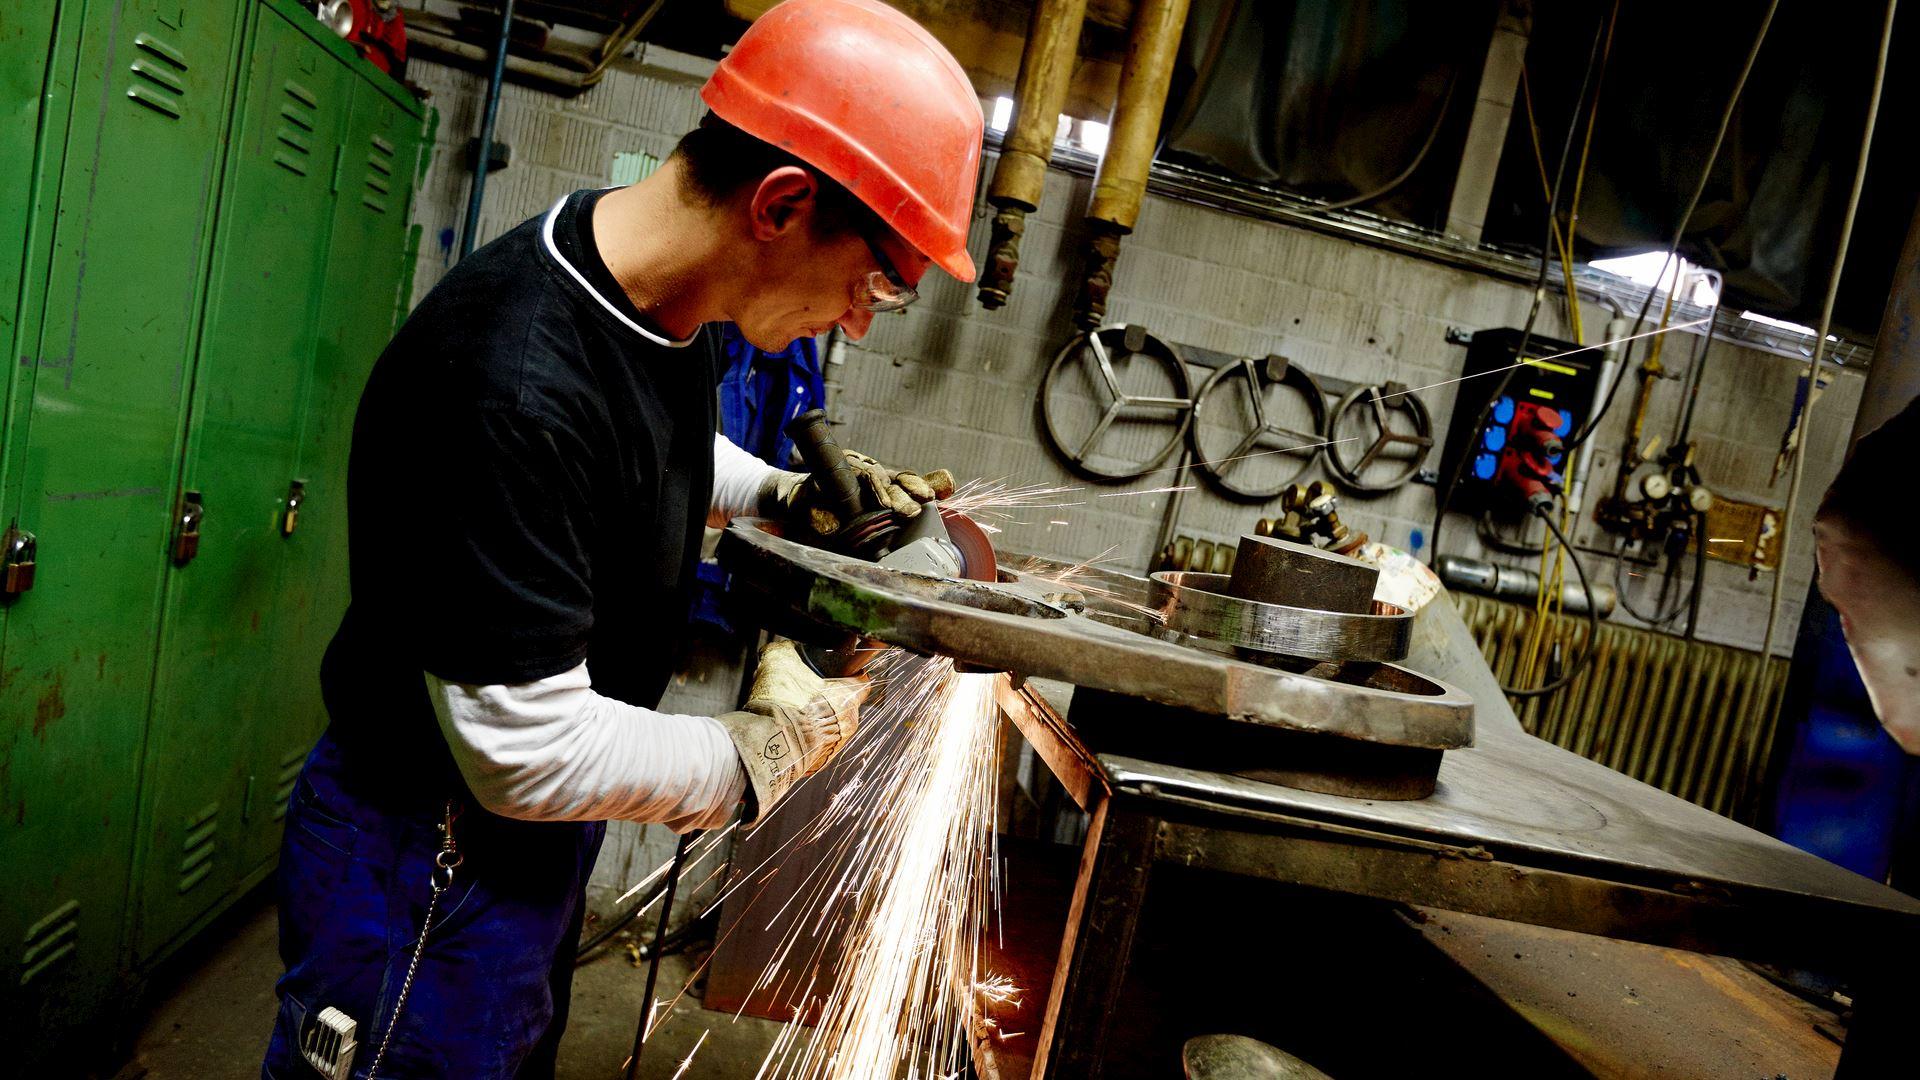 employee, employees, trainee, apprentice, career, factory, germany